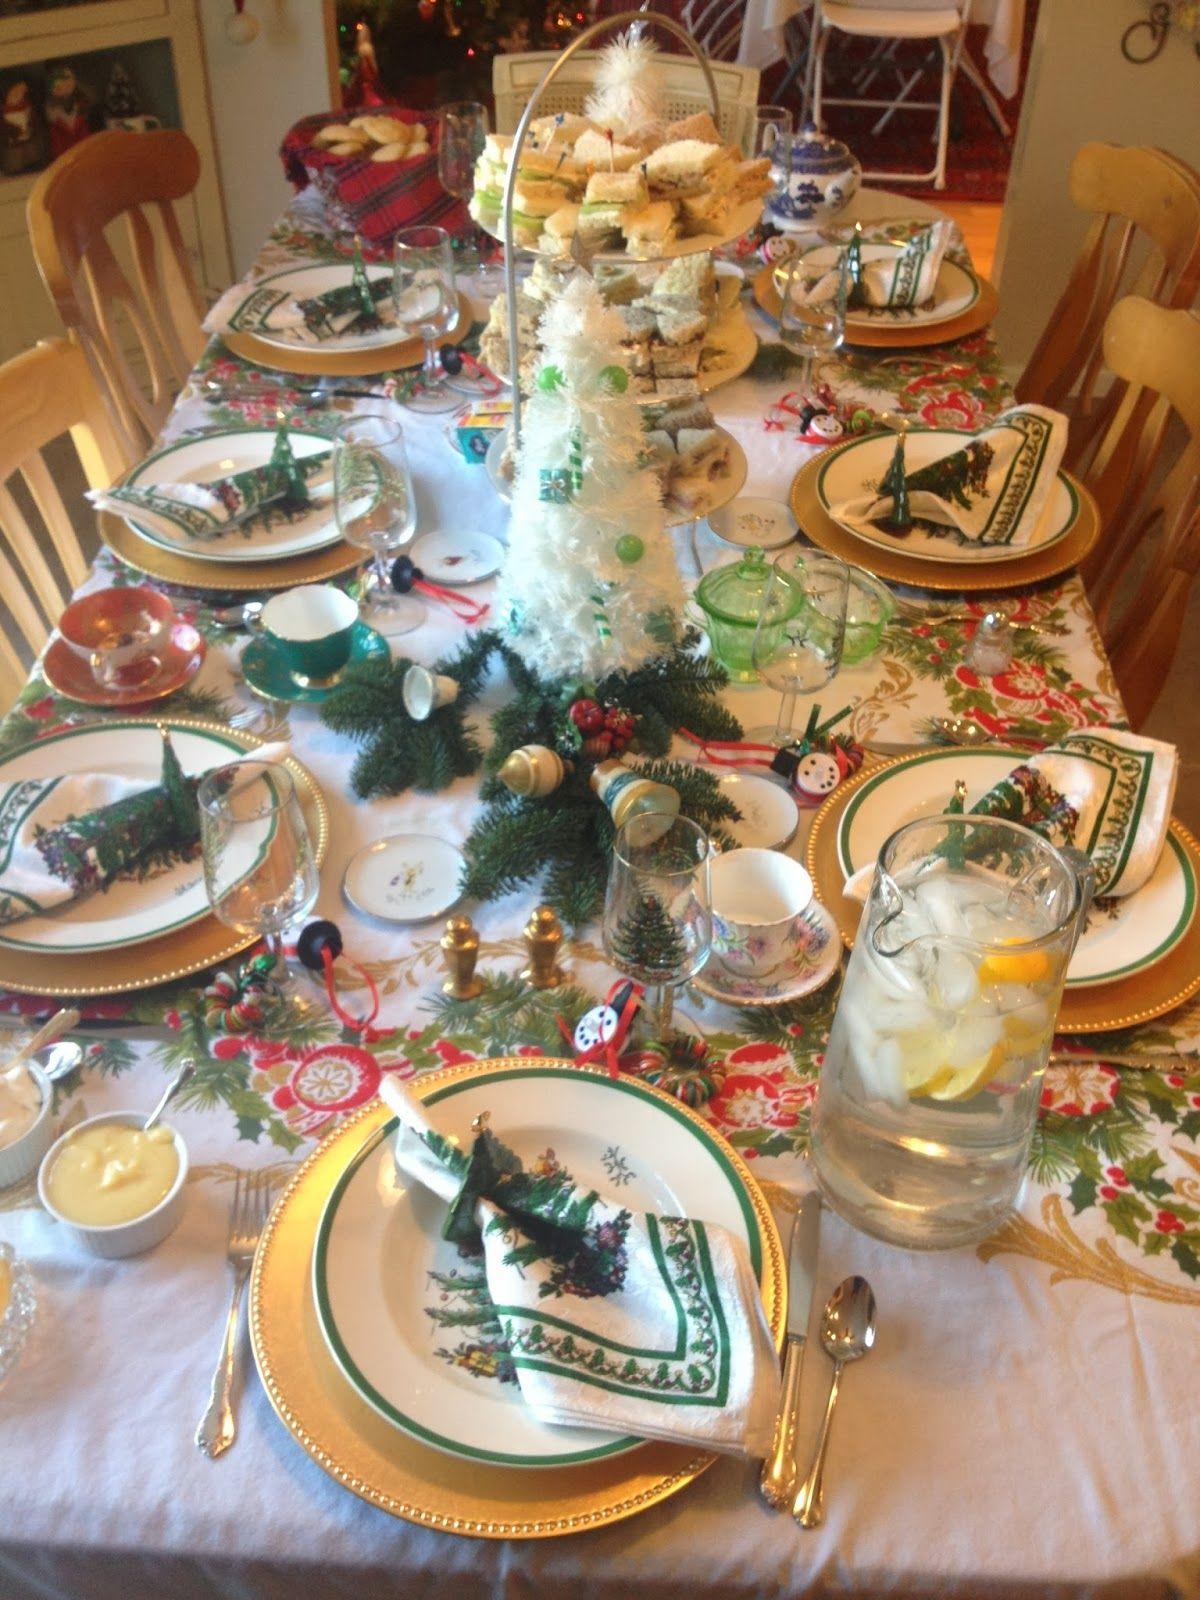 Spode Christmas Tree Table Settings Google Search Christmas Tableware Spode Christmas Spode Christmas Tree